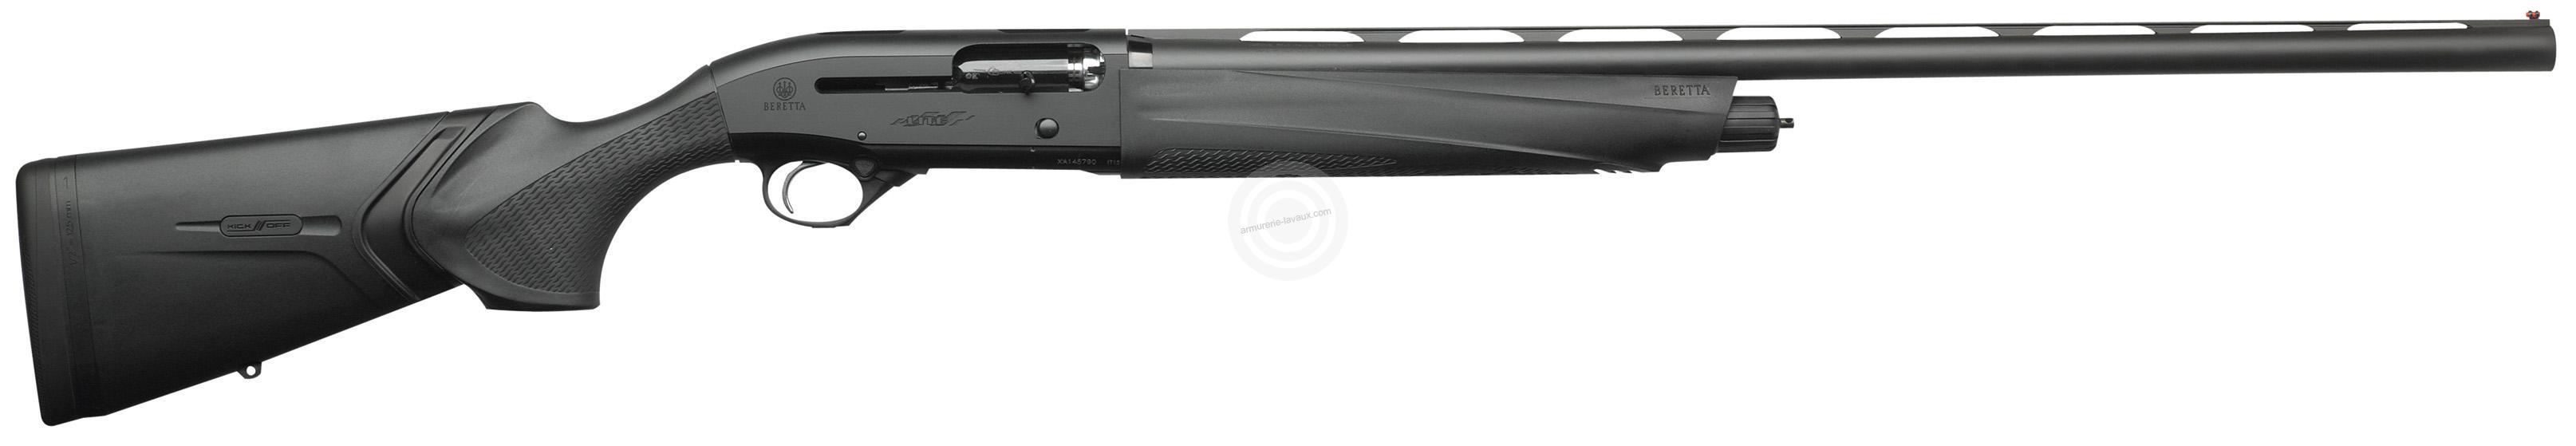 Fusil Semi-Automatique BERETTA XPLOR A400 LITE Synthetic